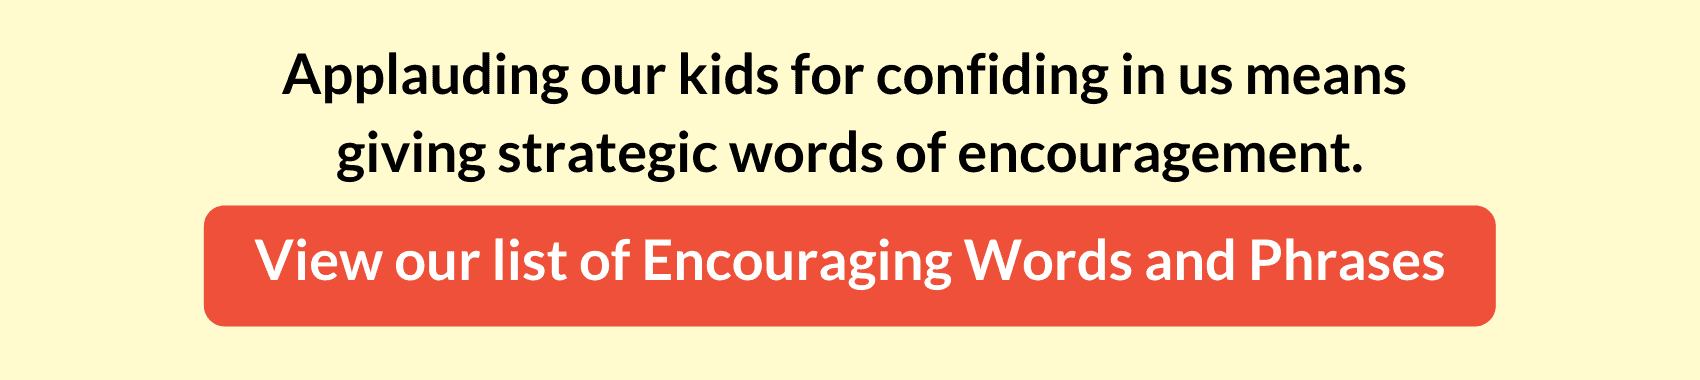 list of encouraging words